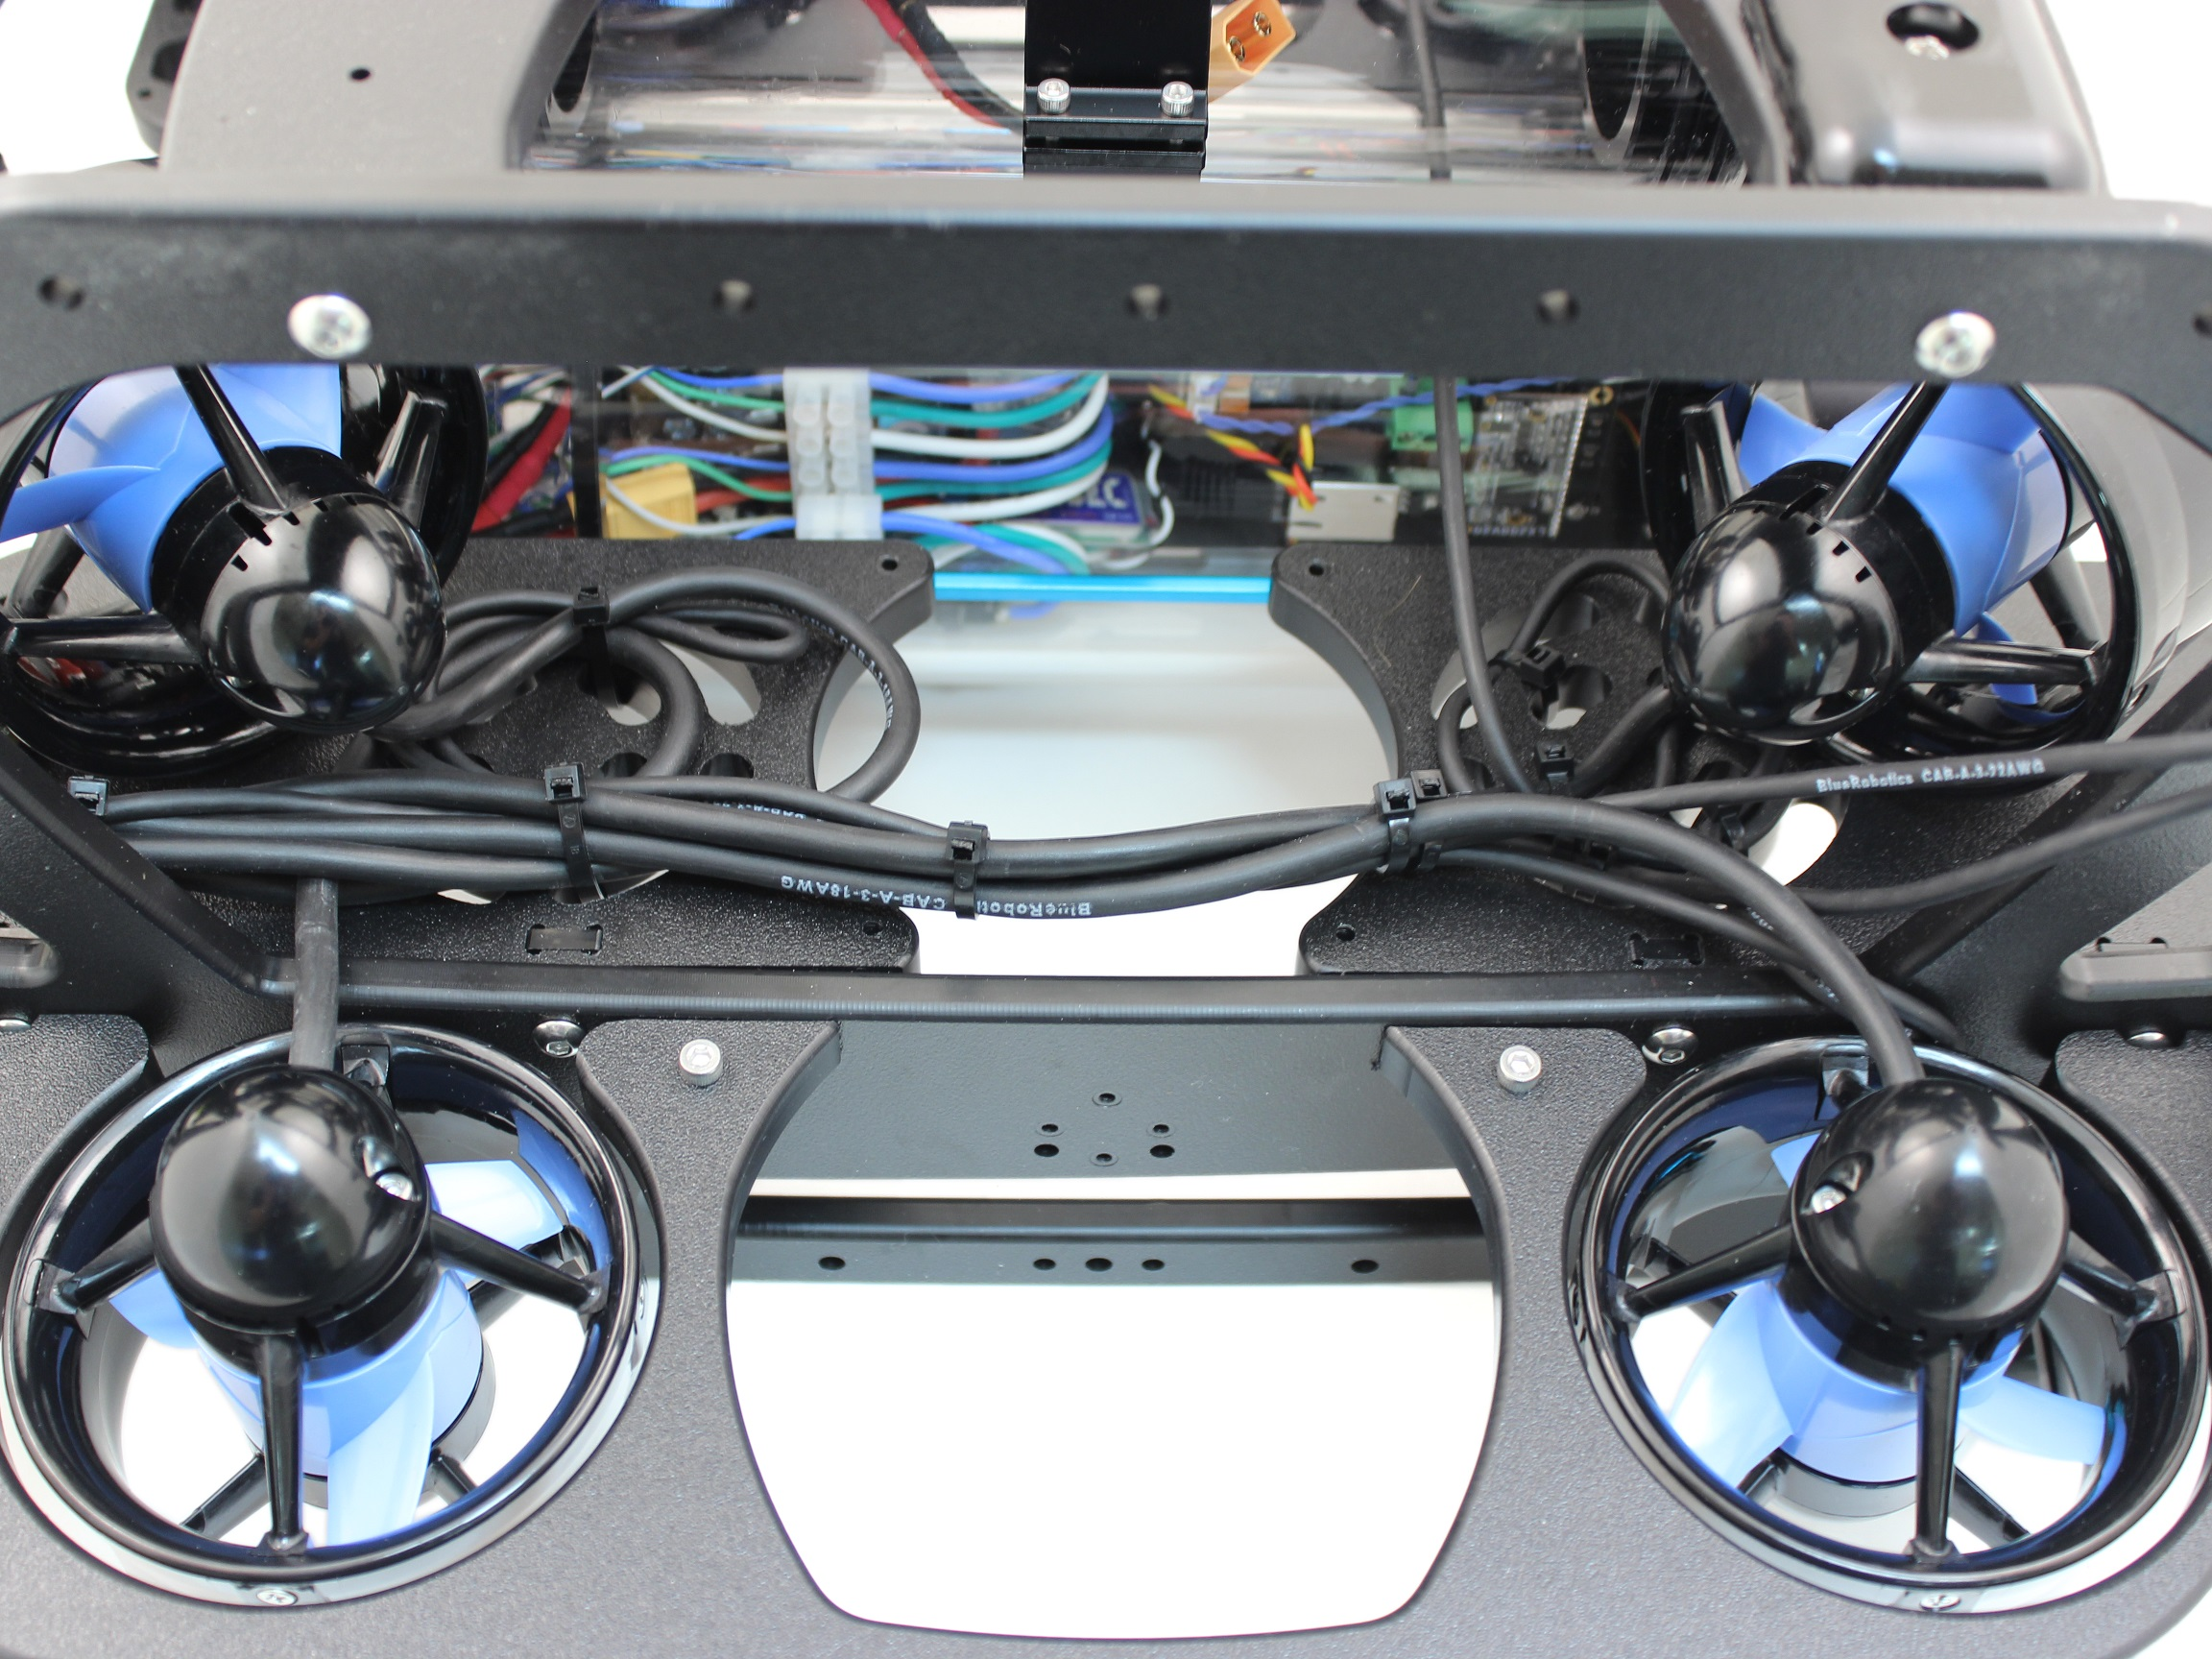 small resolution of bluerov2 heavy configuration retrofit kit installation